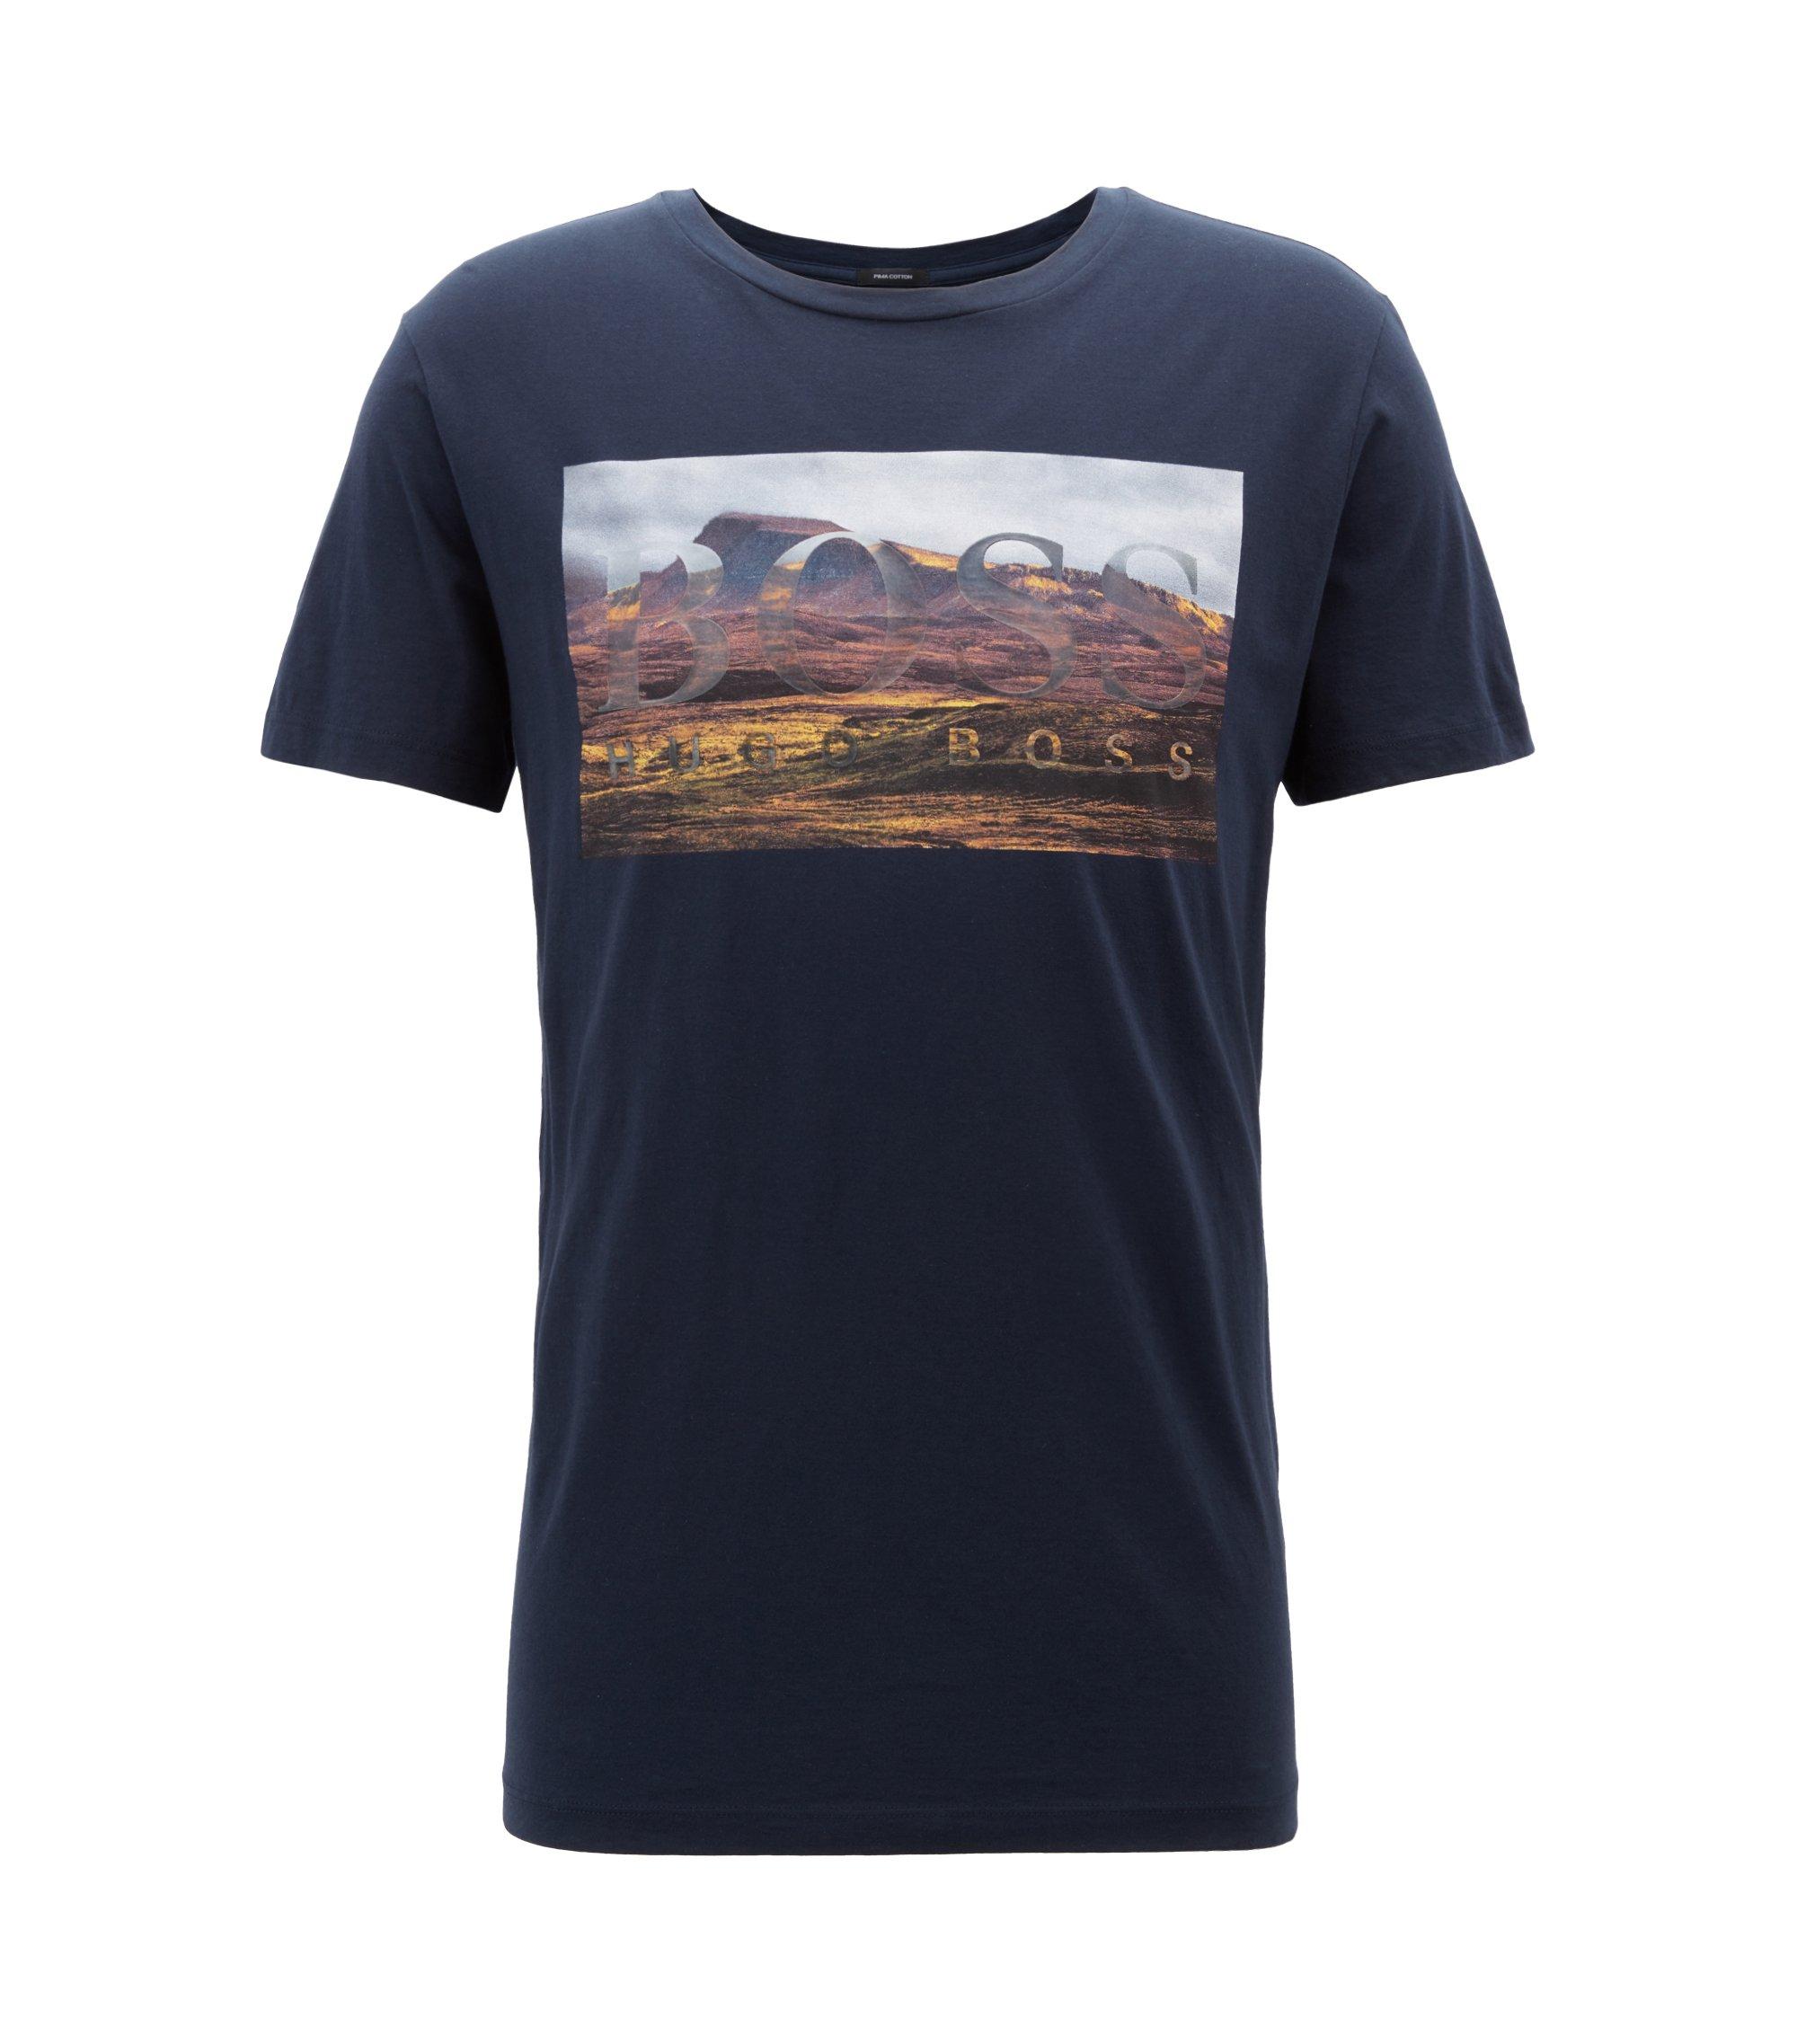 Camiseta gráfica de cuello redondo en algodón Pima lavado, Azul oscuro